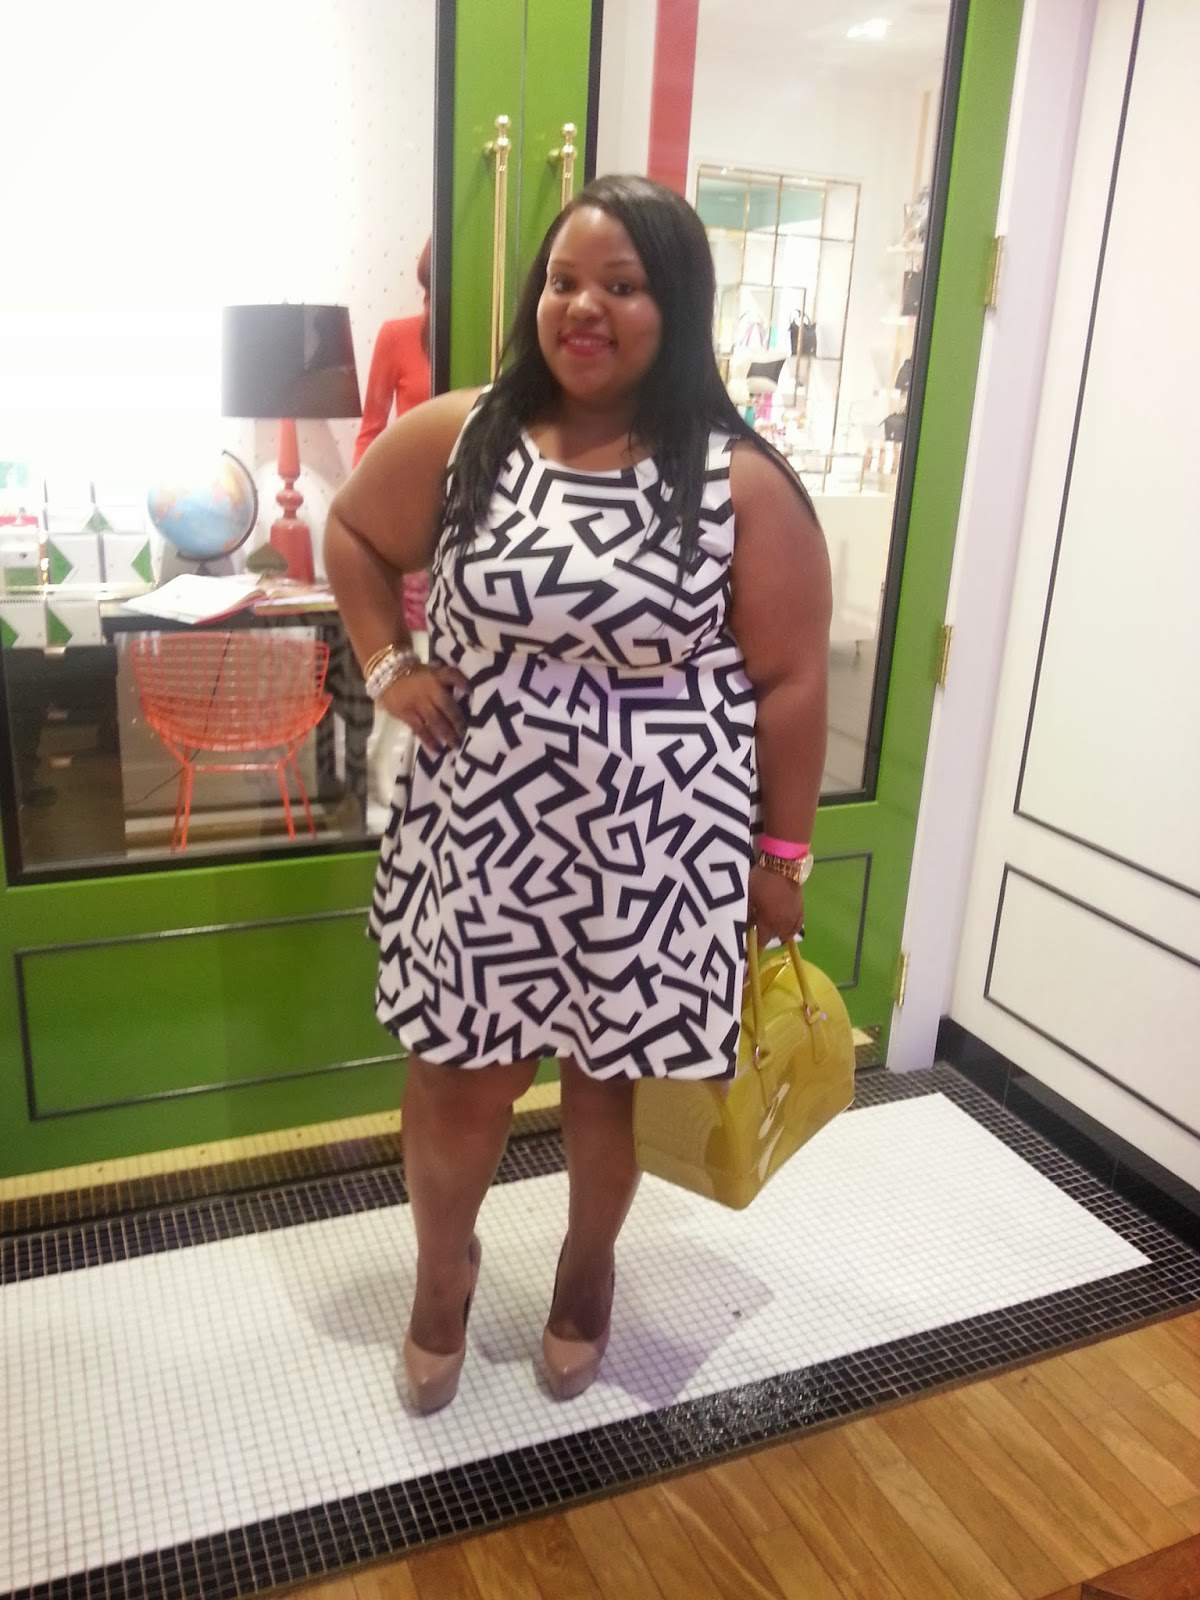 Fashion Blogger Spotlight- Educated Glamour Girl